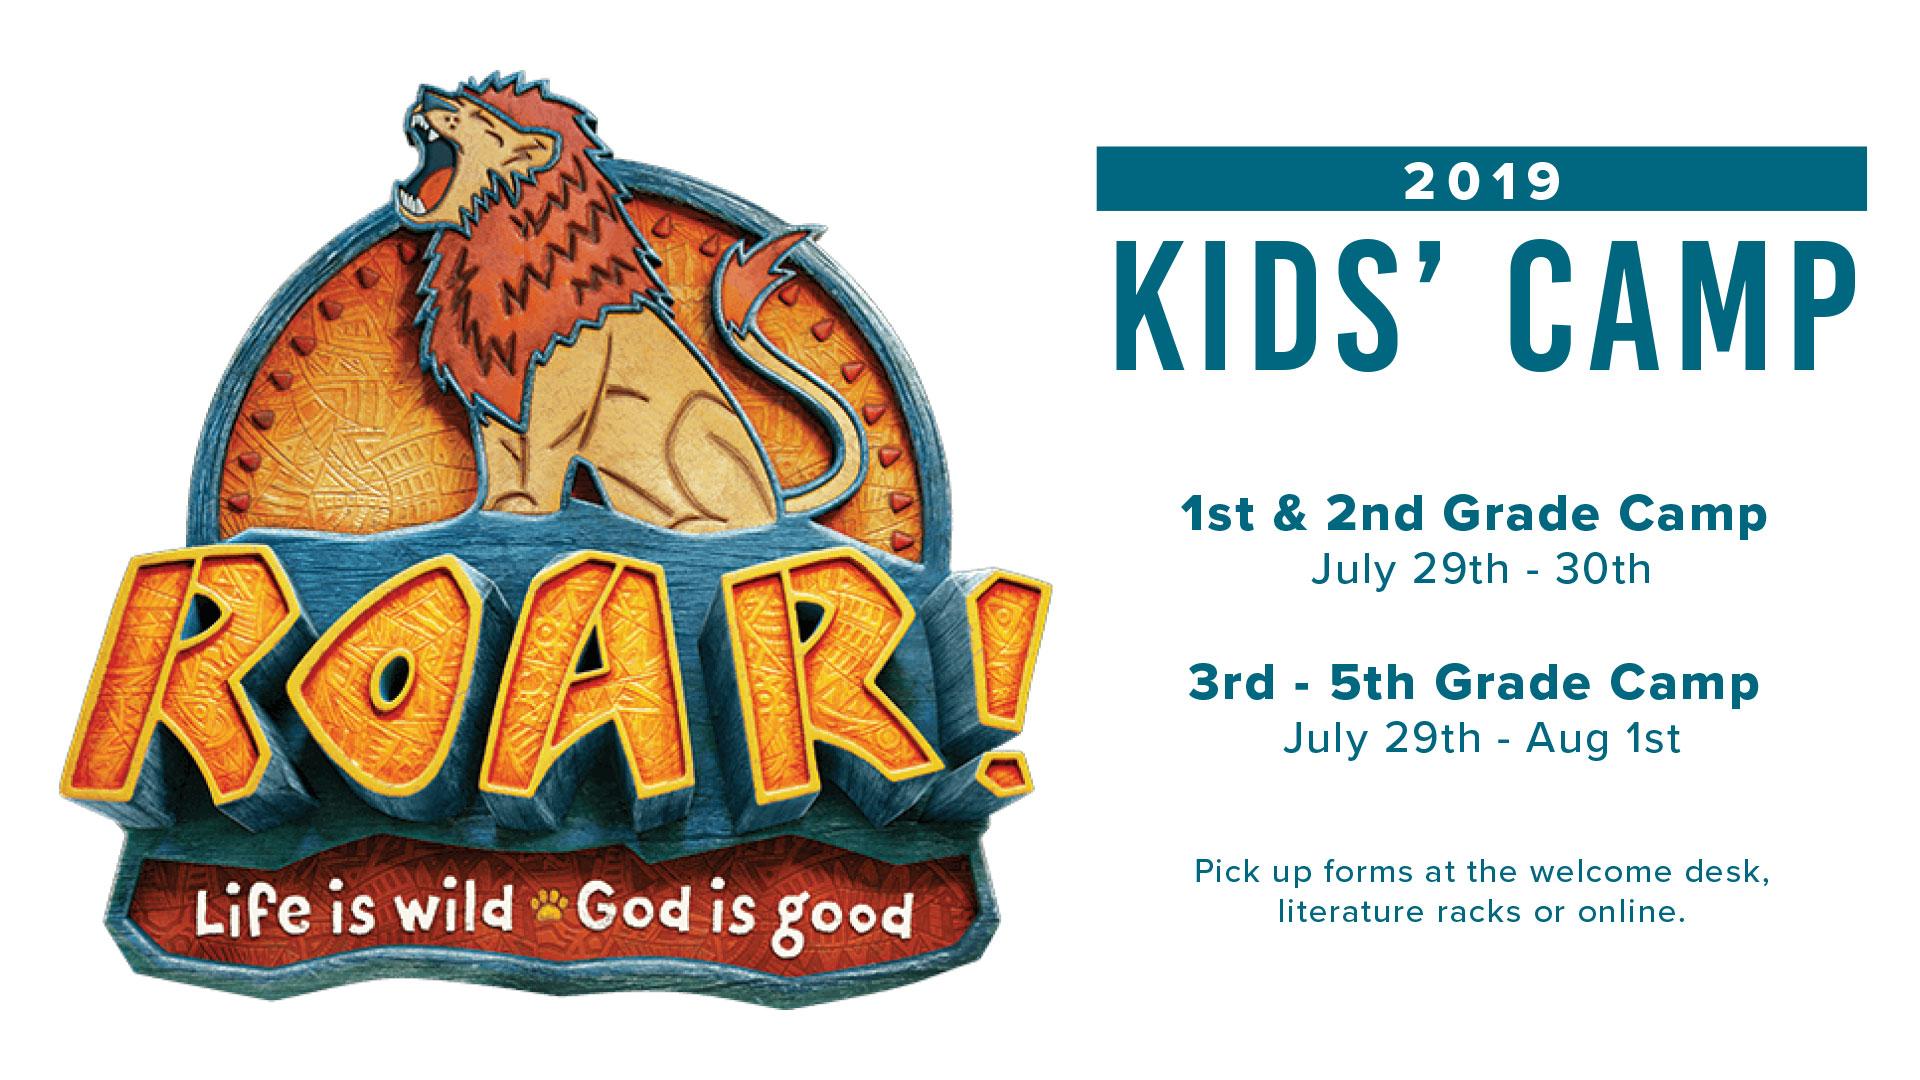 KidsCamp_slide_19.jpg